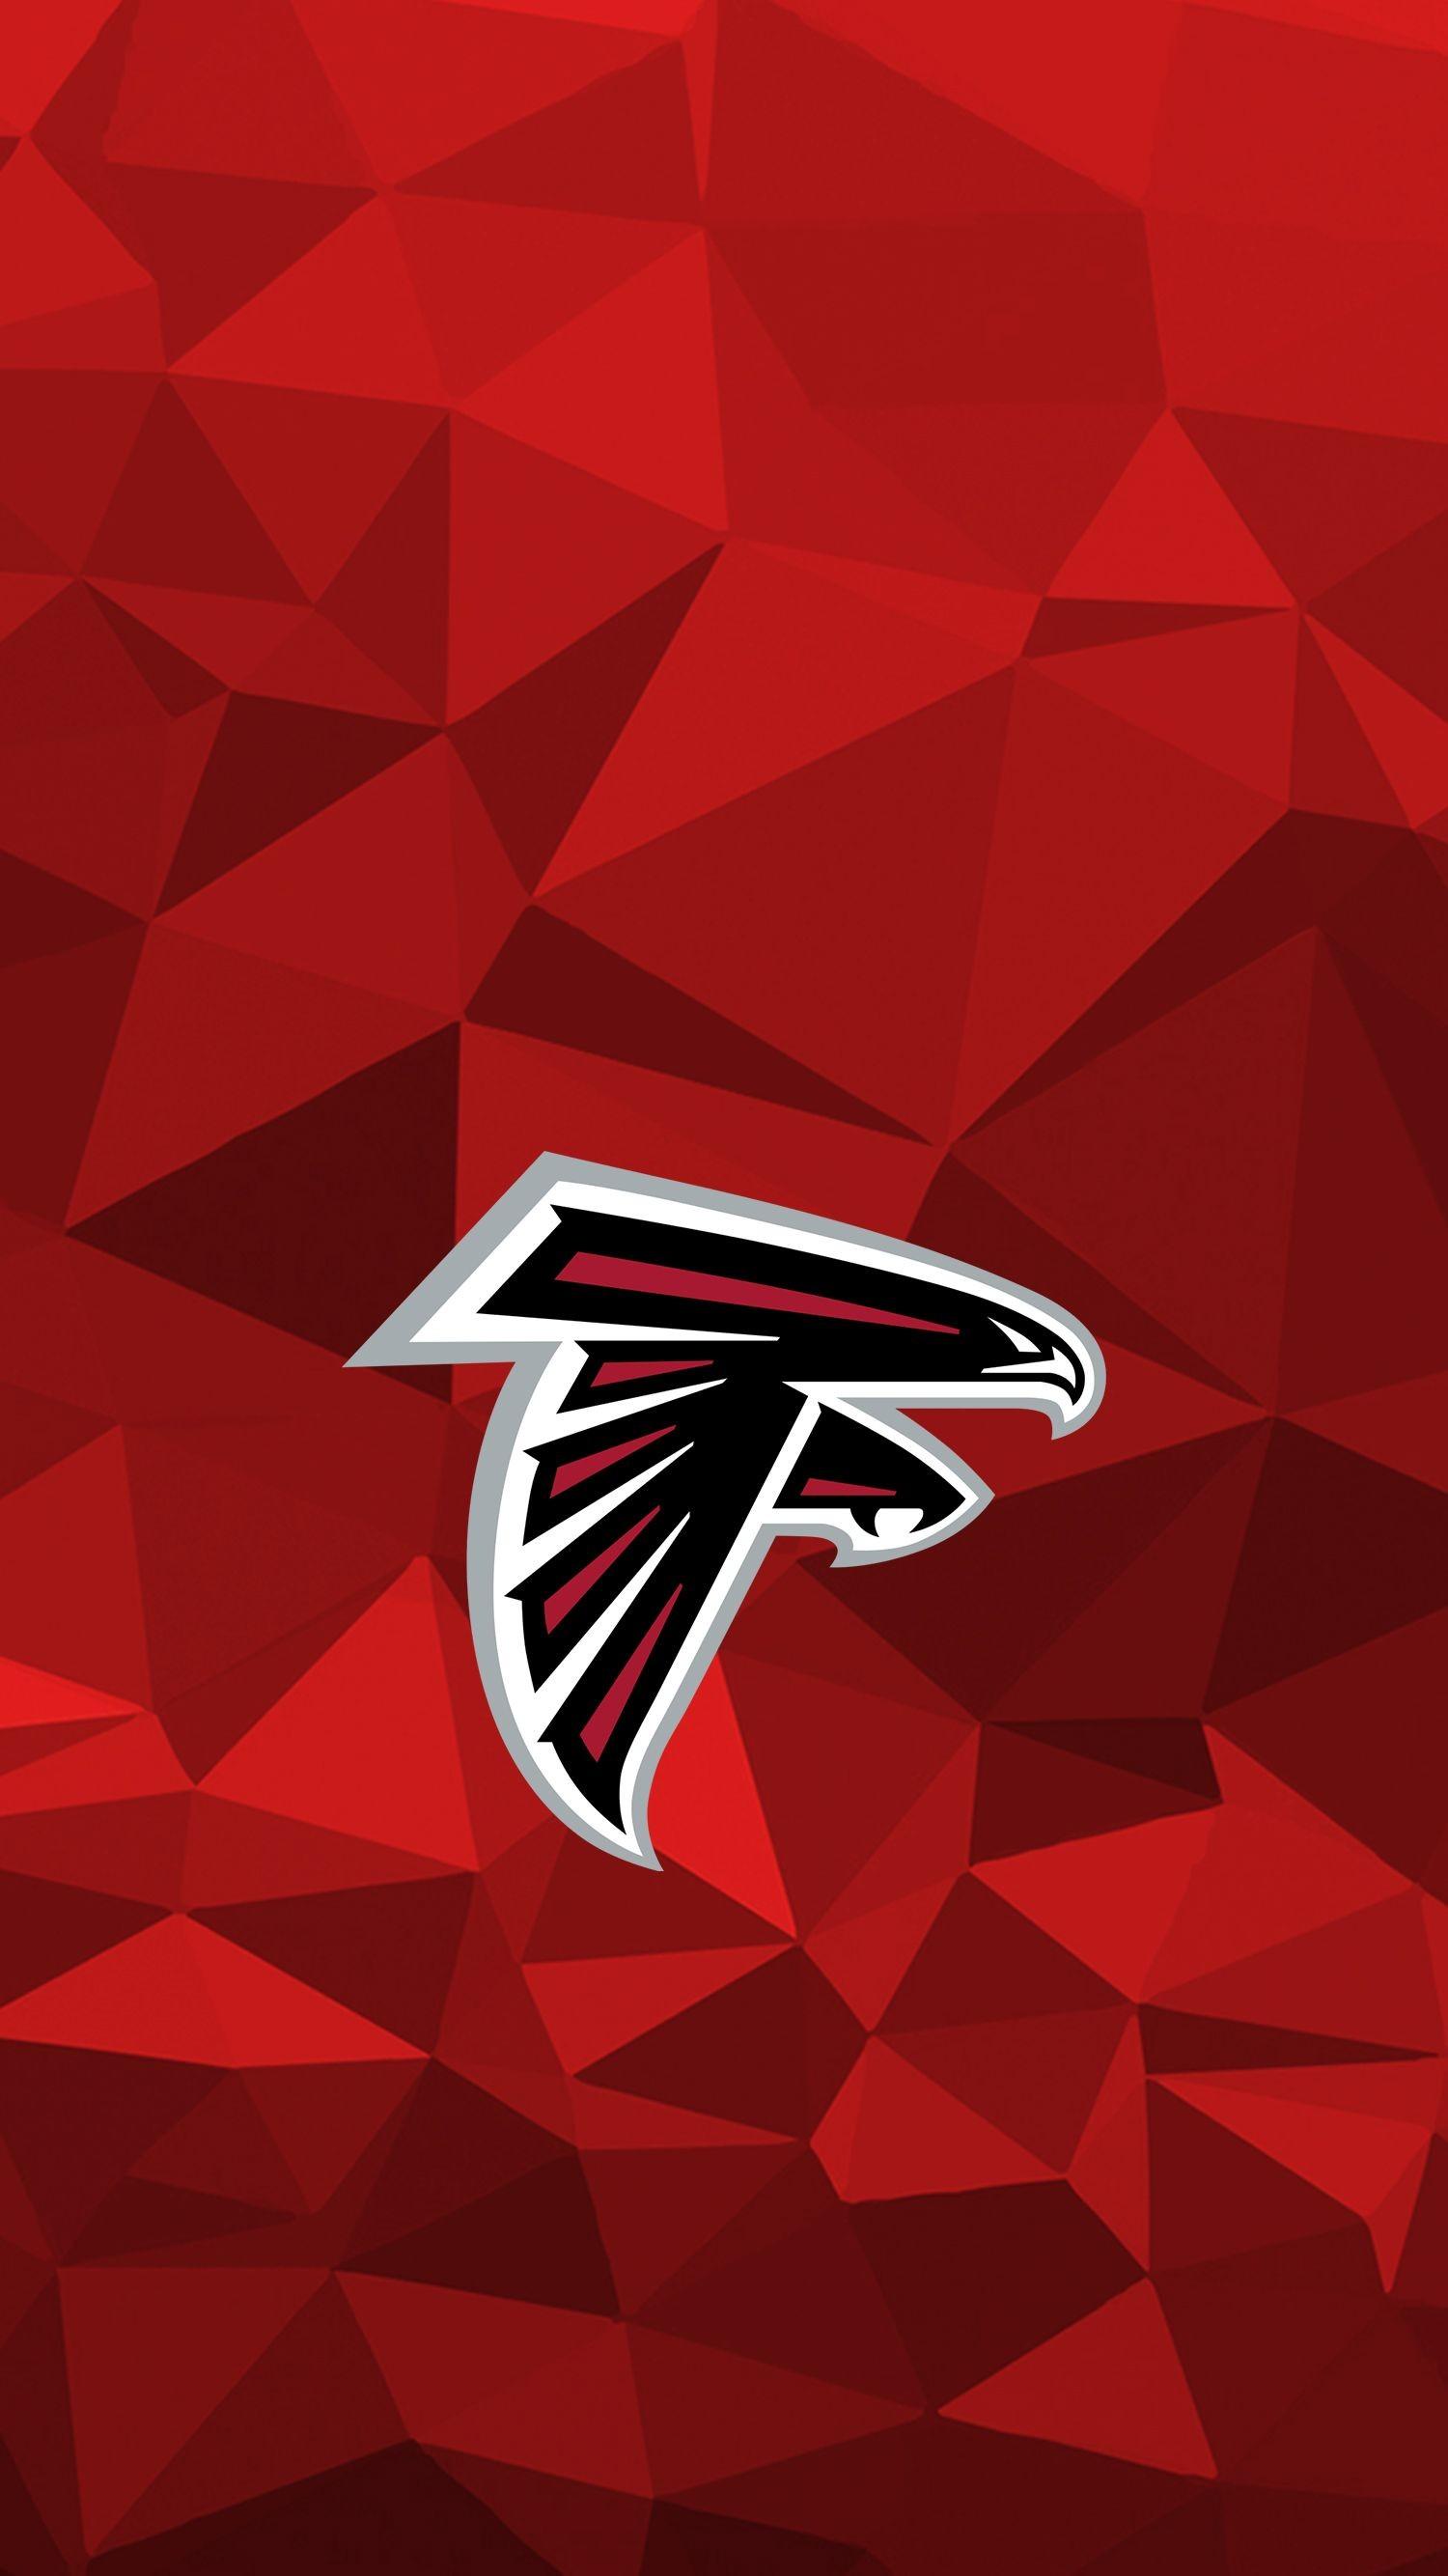 Atlanta Falcons Iphone Wallpaper Seattle Seahawks Vs Atlanta Falcons Nfl 2019 Live 1500x2668 Download Hd Wallpaper Wallpapertip